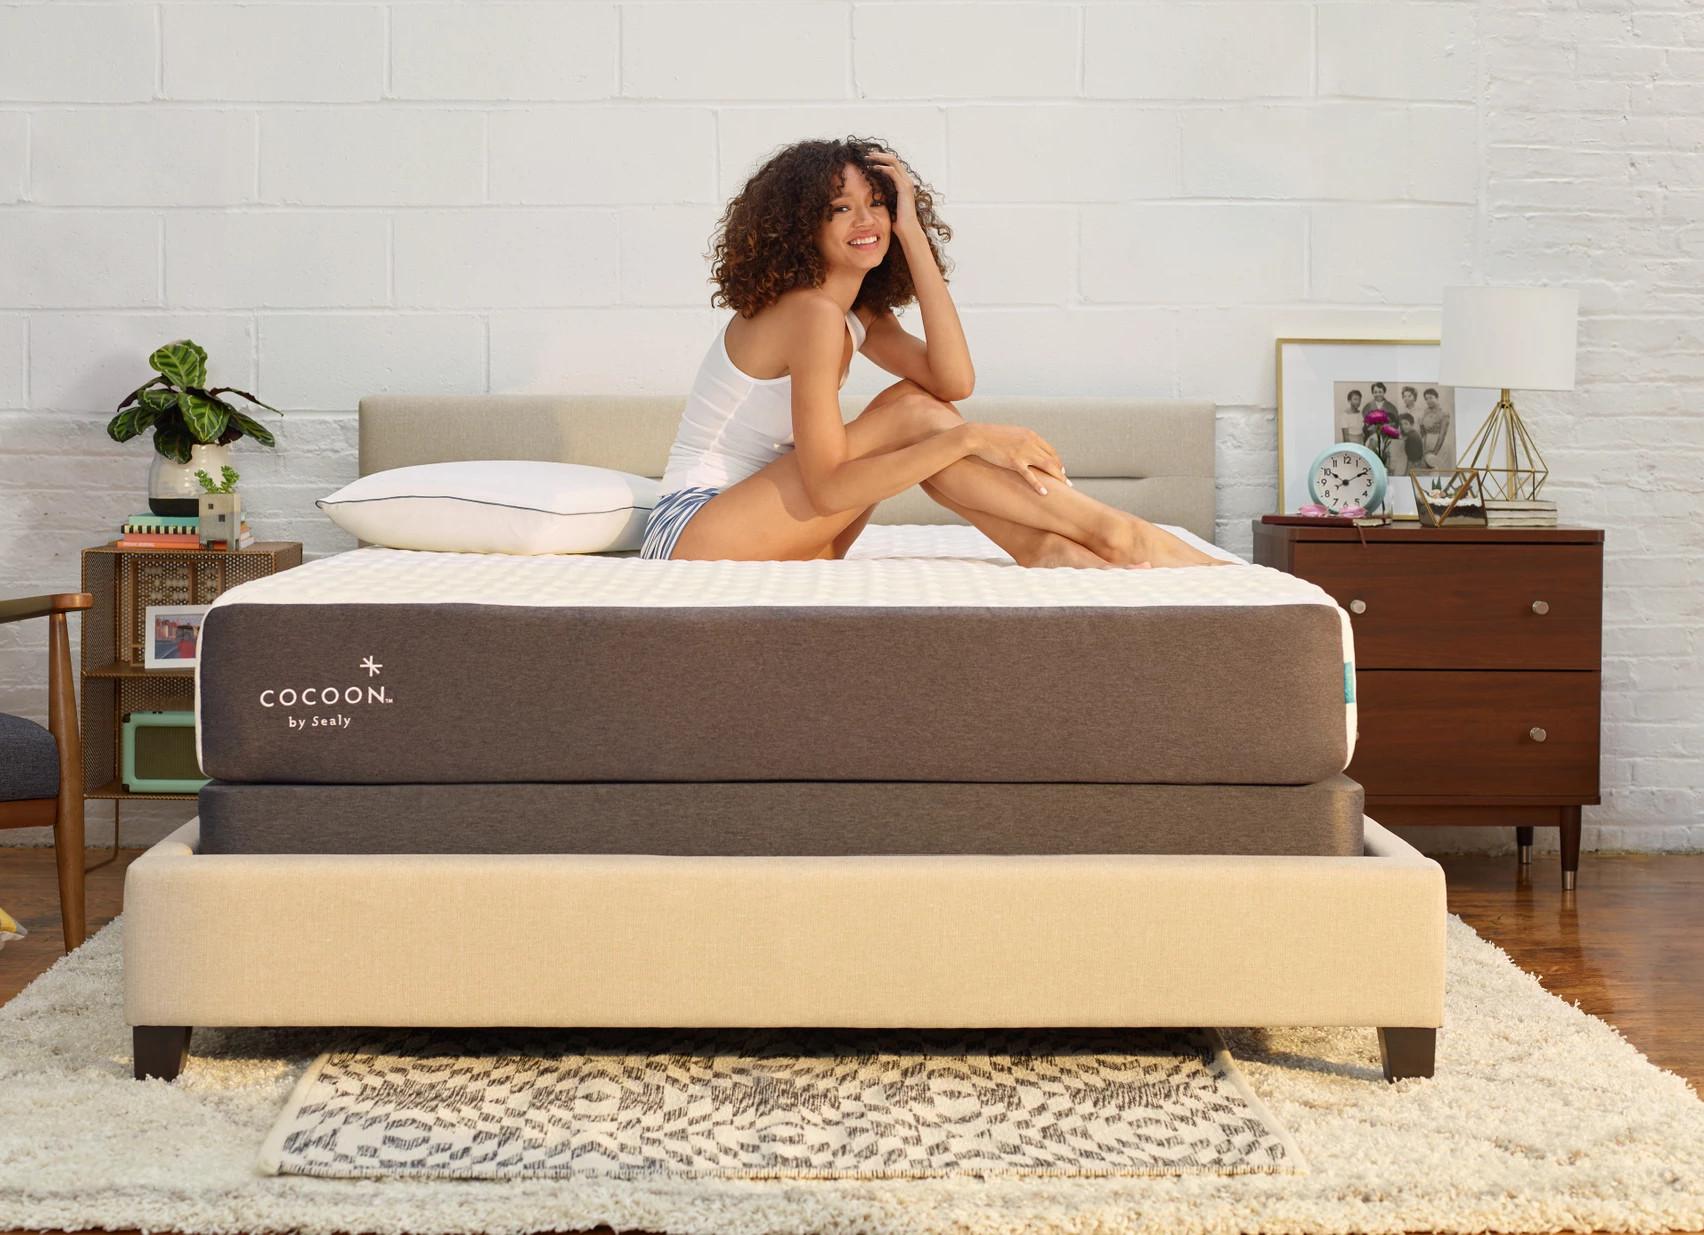 compatible cocoon mattresses